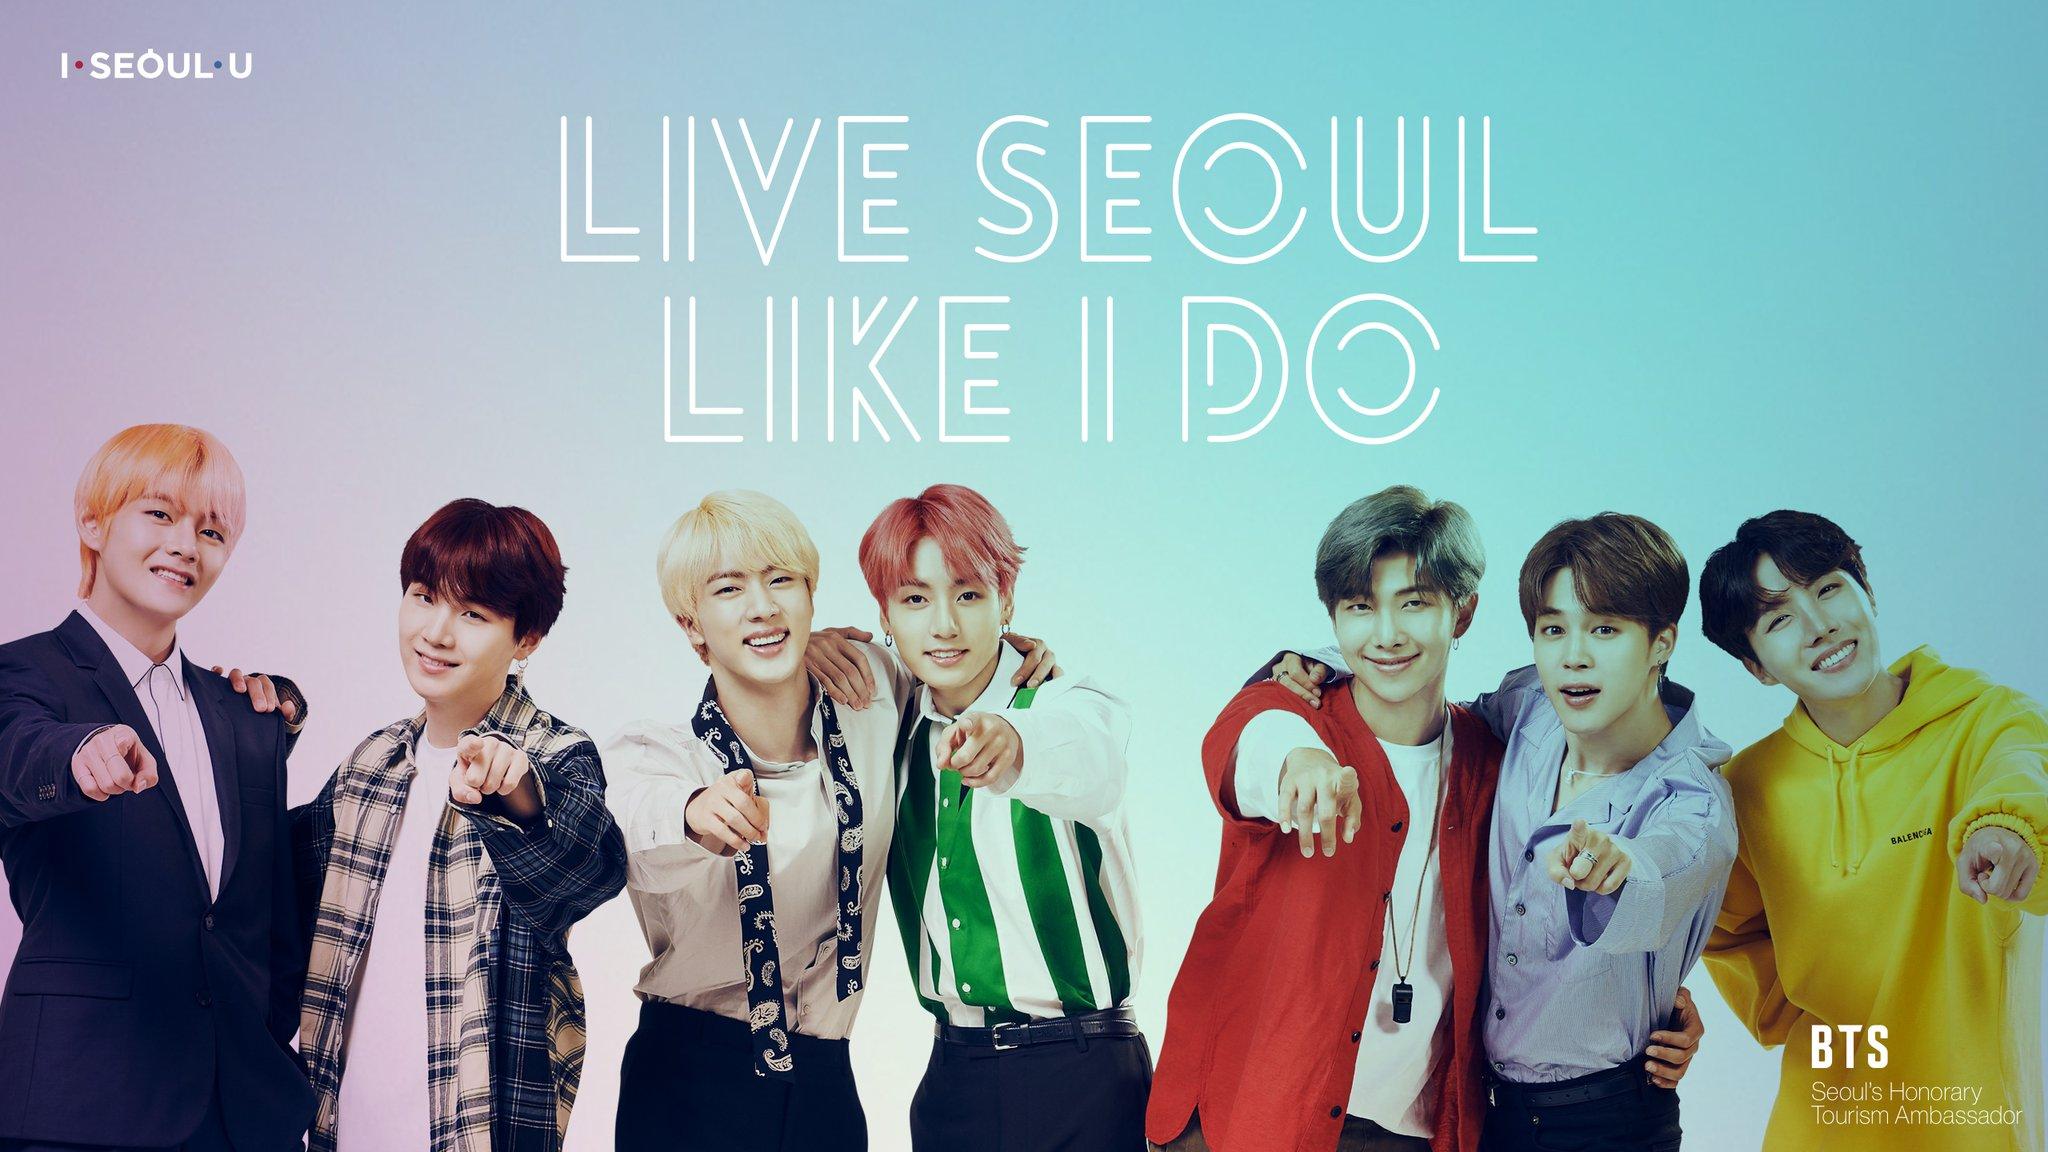 Picture] BTS Live Seoul Like I Do 2018 Seoul City Print